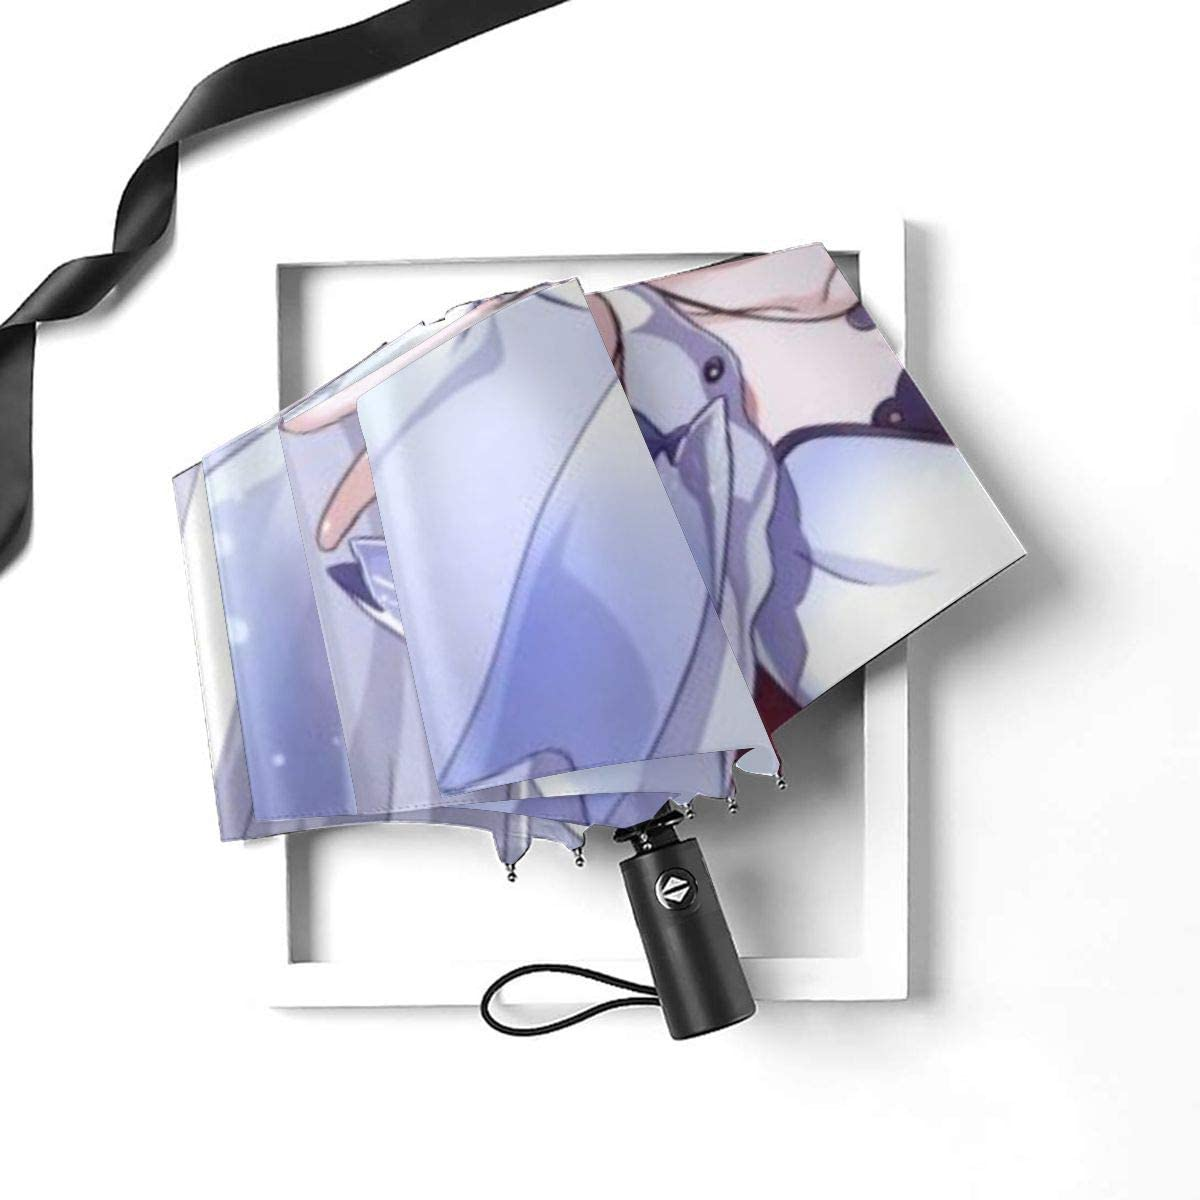 PatriciaHeredia RWBY Weiss Schnee Anime Automatic Tri-fold Umbrella